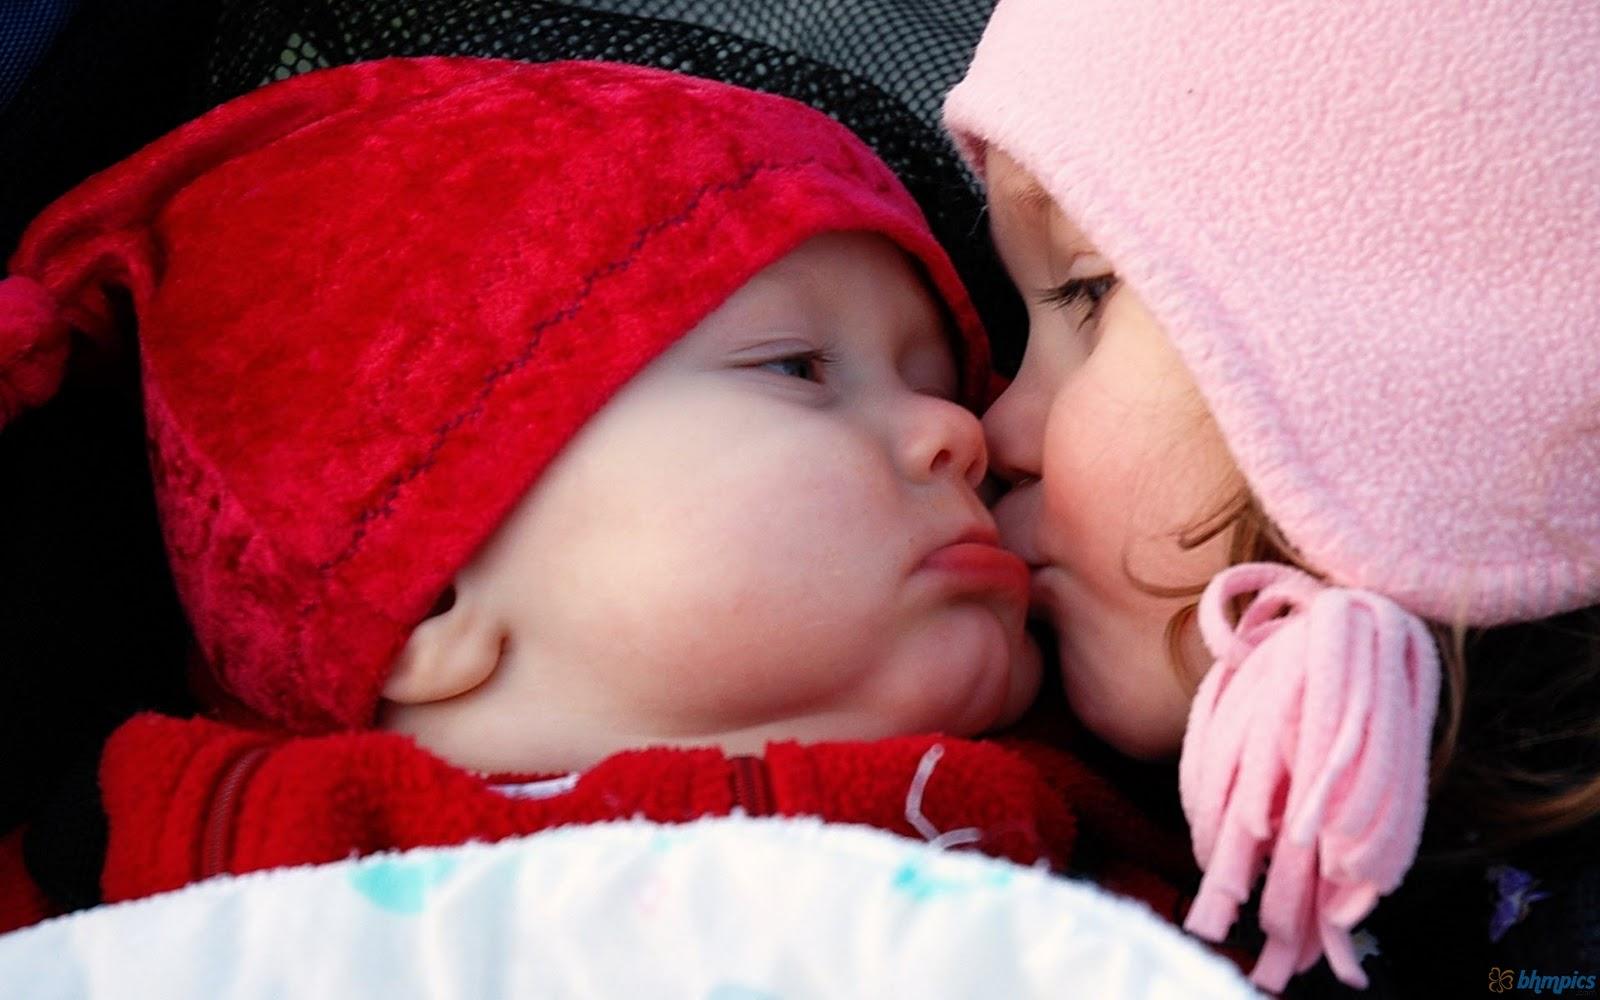 http://3.bp.blogspot.com/-DLqupLAeTLE/Tug6cZDmoeI/AAAAAAAAAb8/idAKedkPK3A/s1600/cute_kiss-1920x1200.jpg